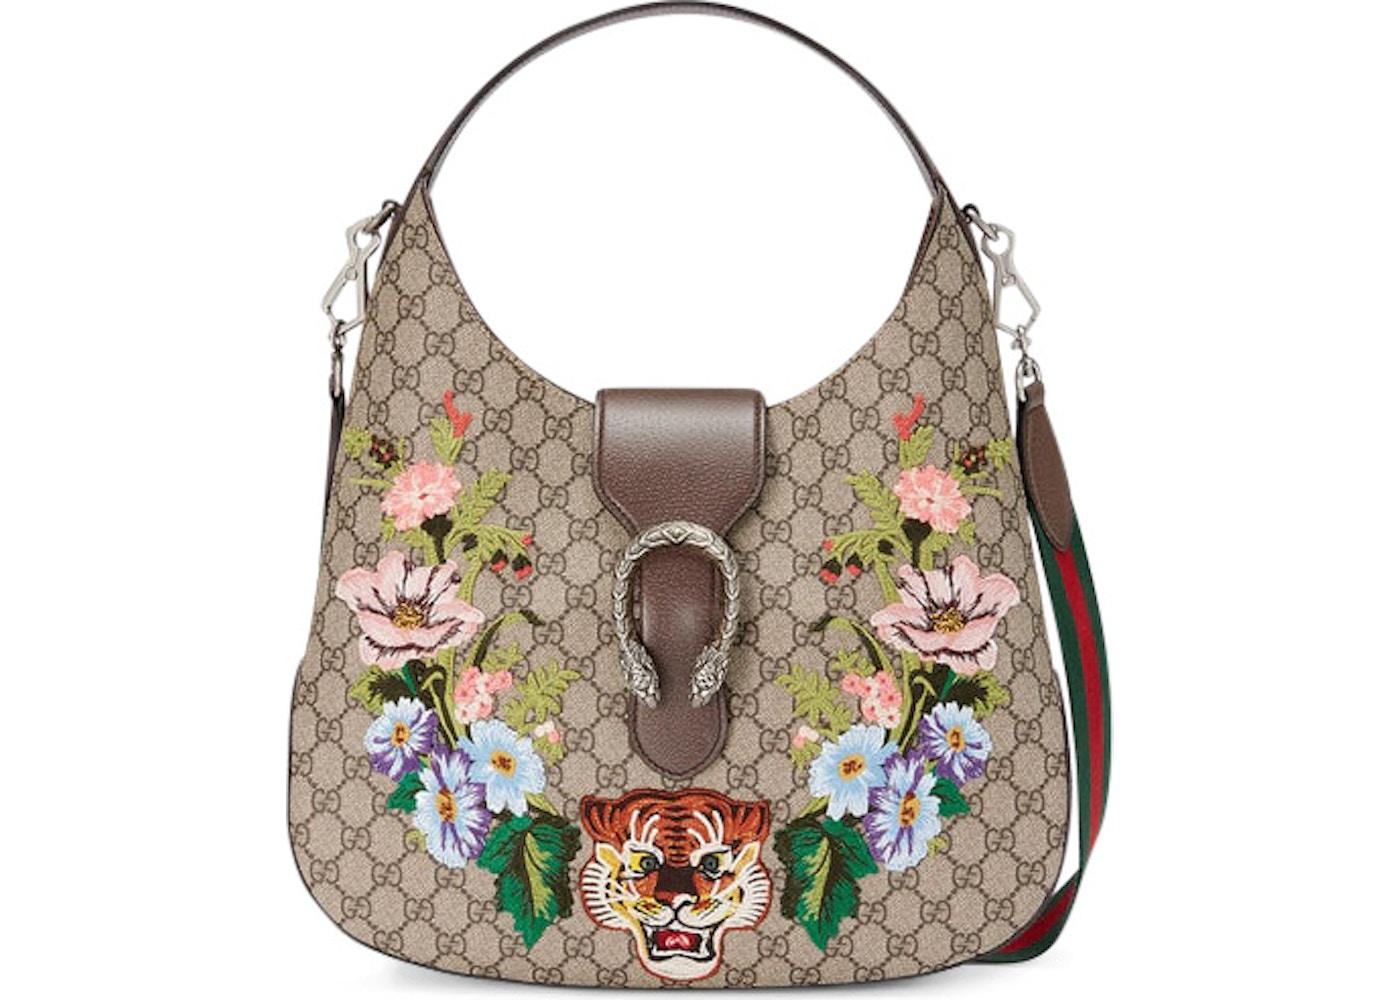 bb8db6b5 Gucci Dionysus Hobo GG Embroidered Tiger/Floral Medium Brown ...